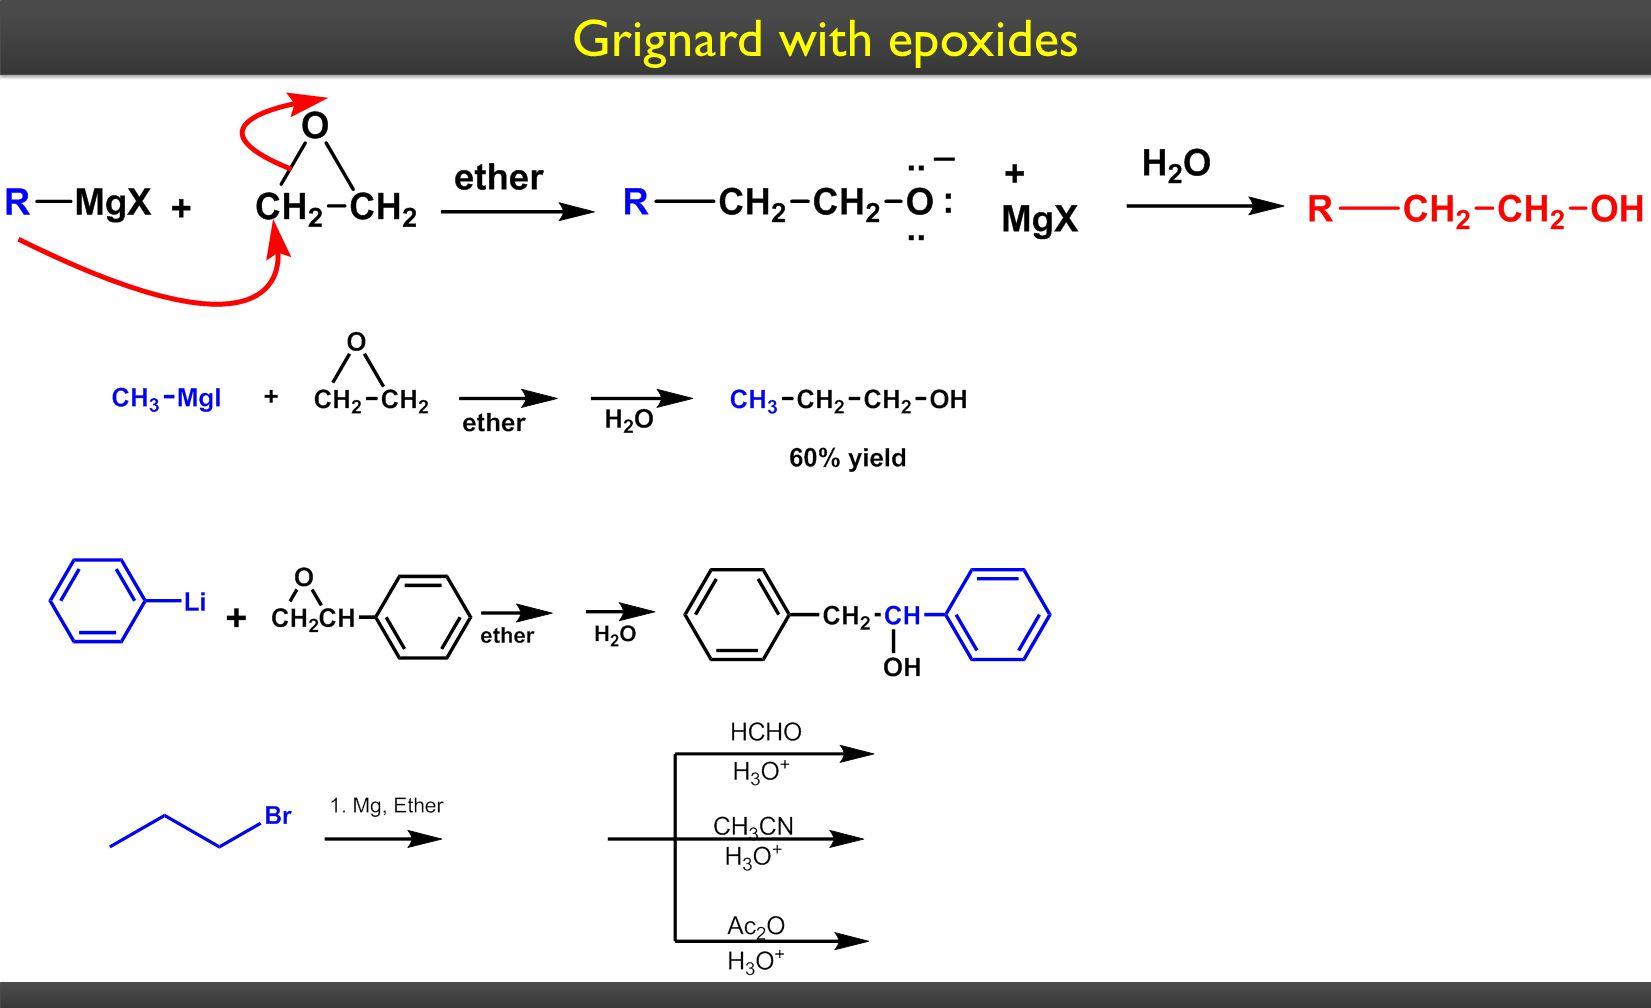 Grignard with epoxides